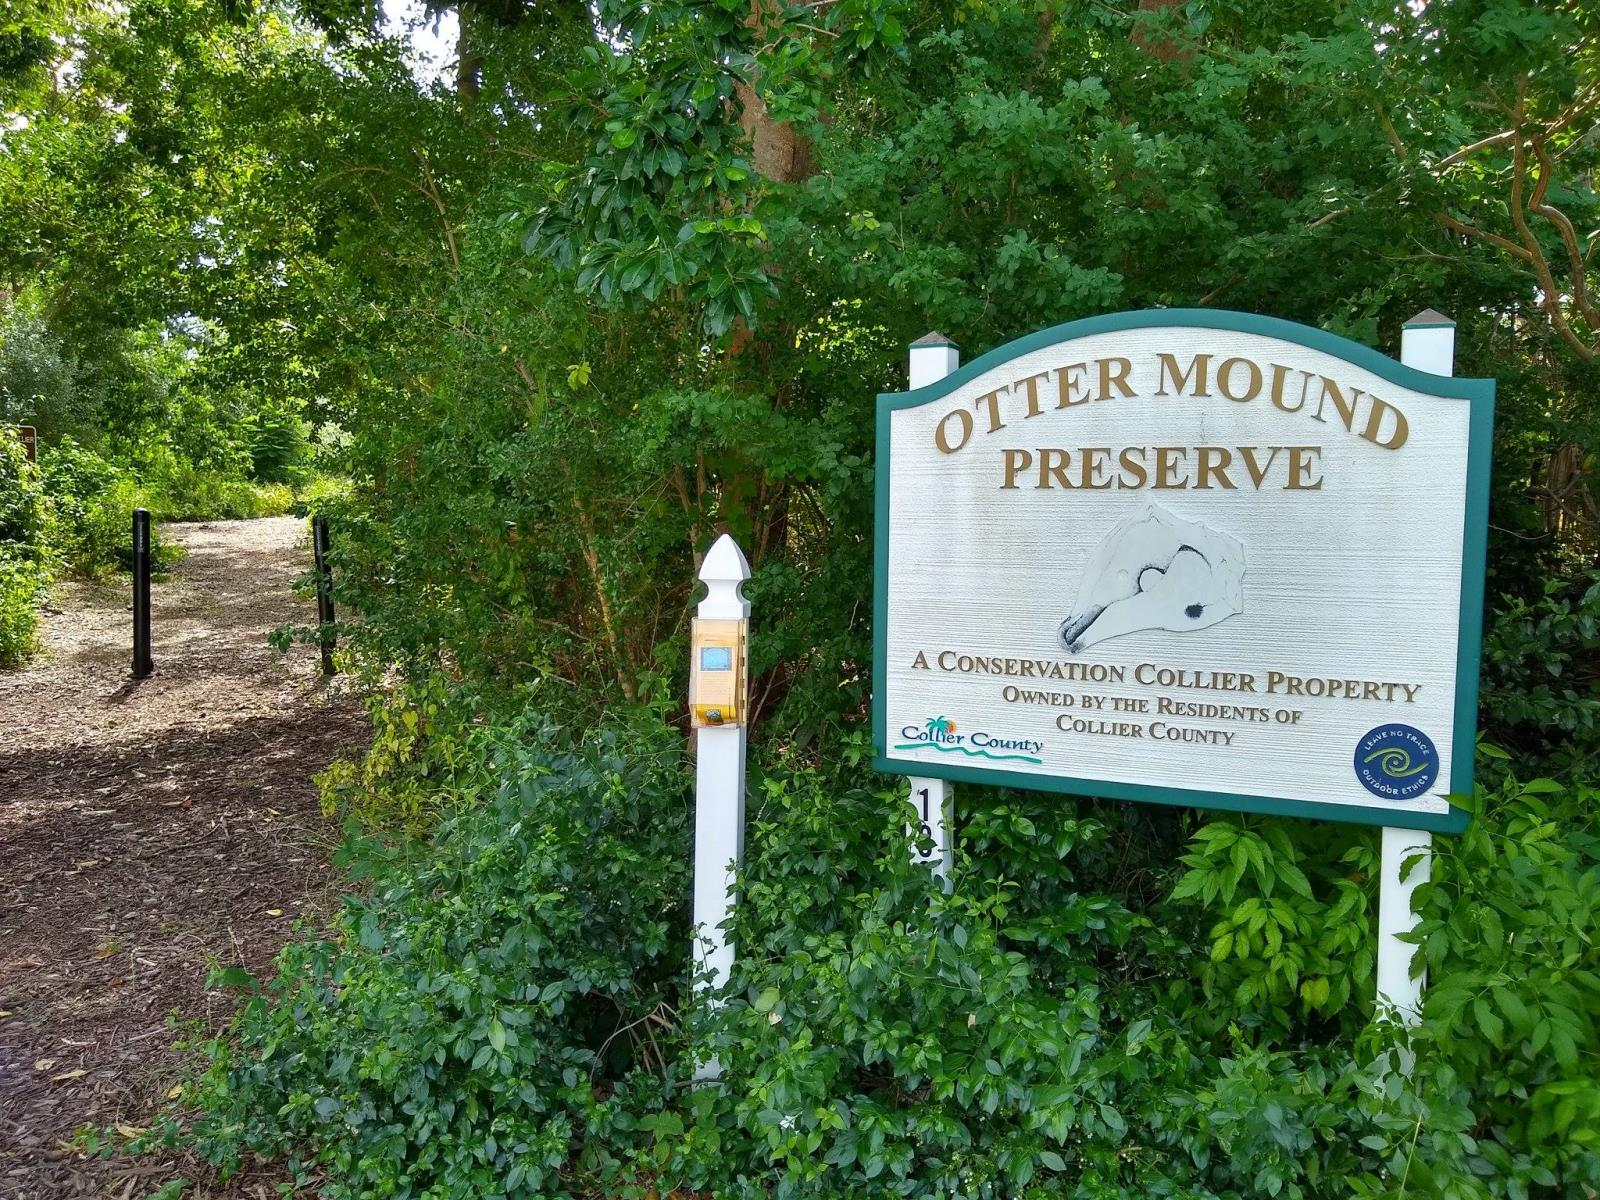 Otter Mound Preserve   Collier County, FL